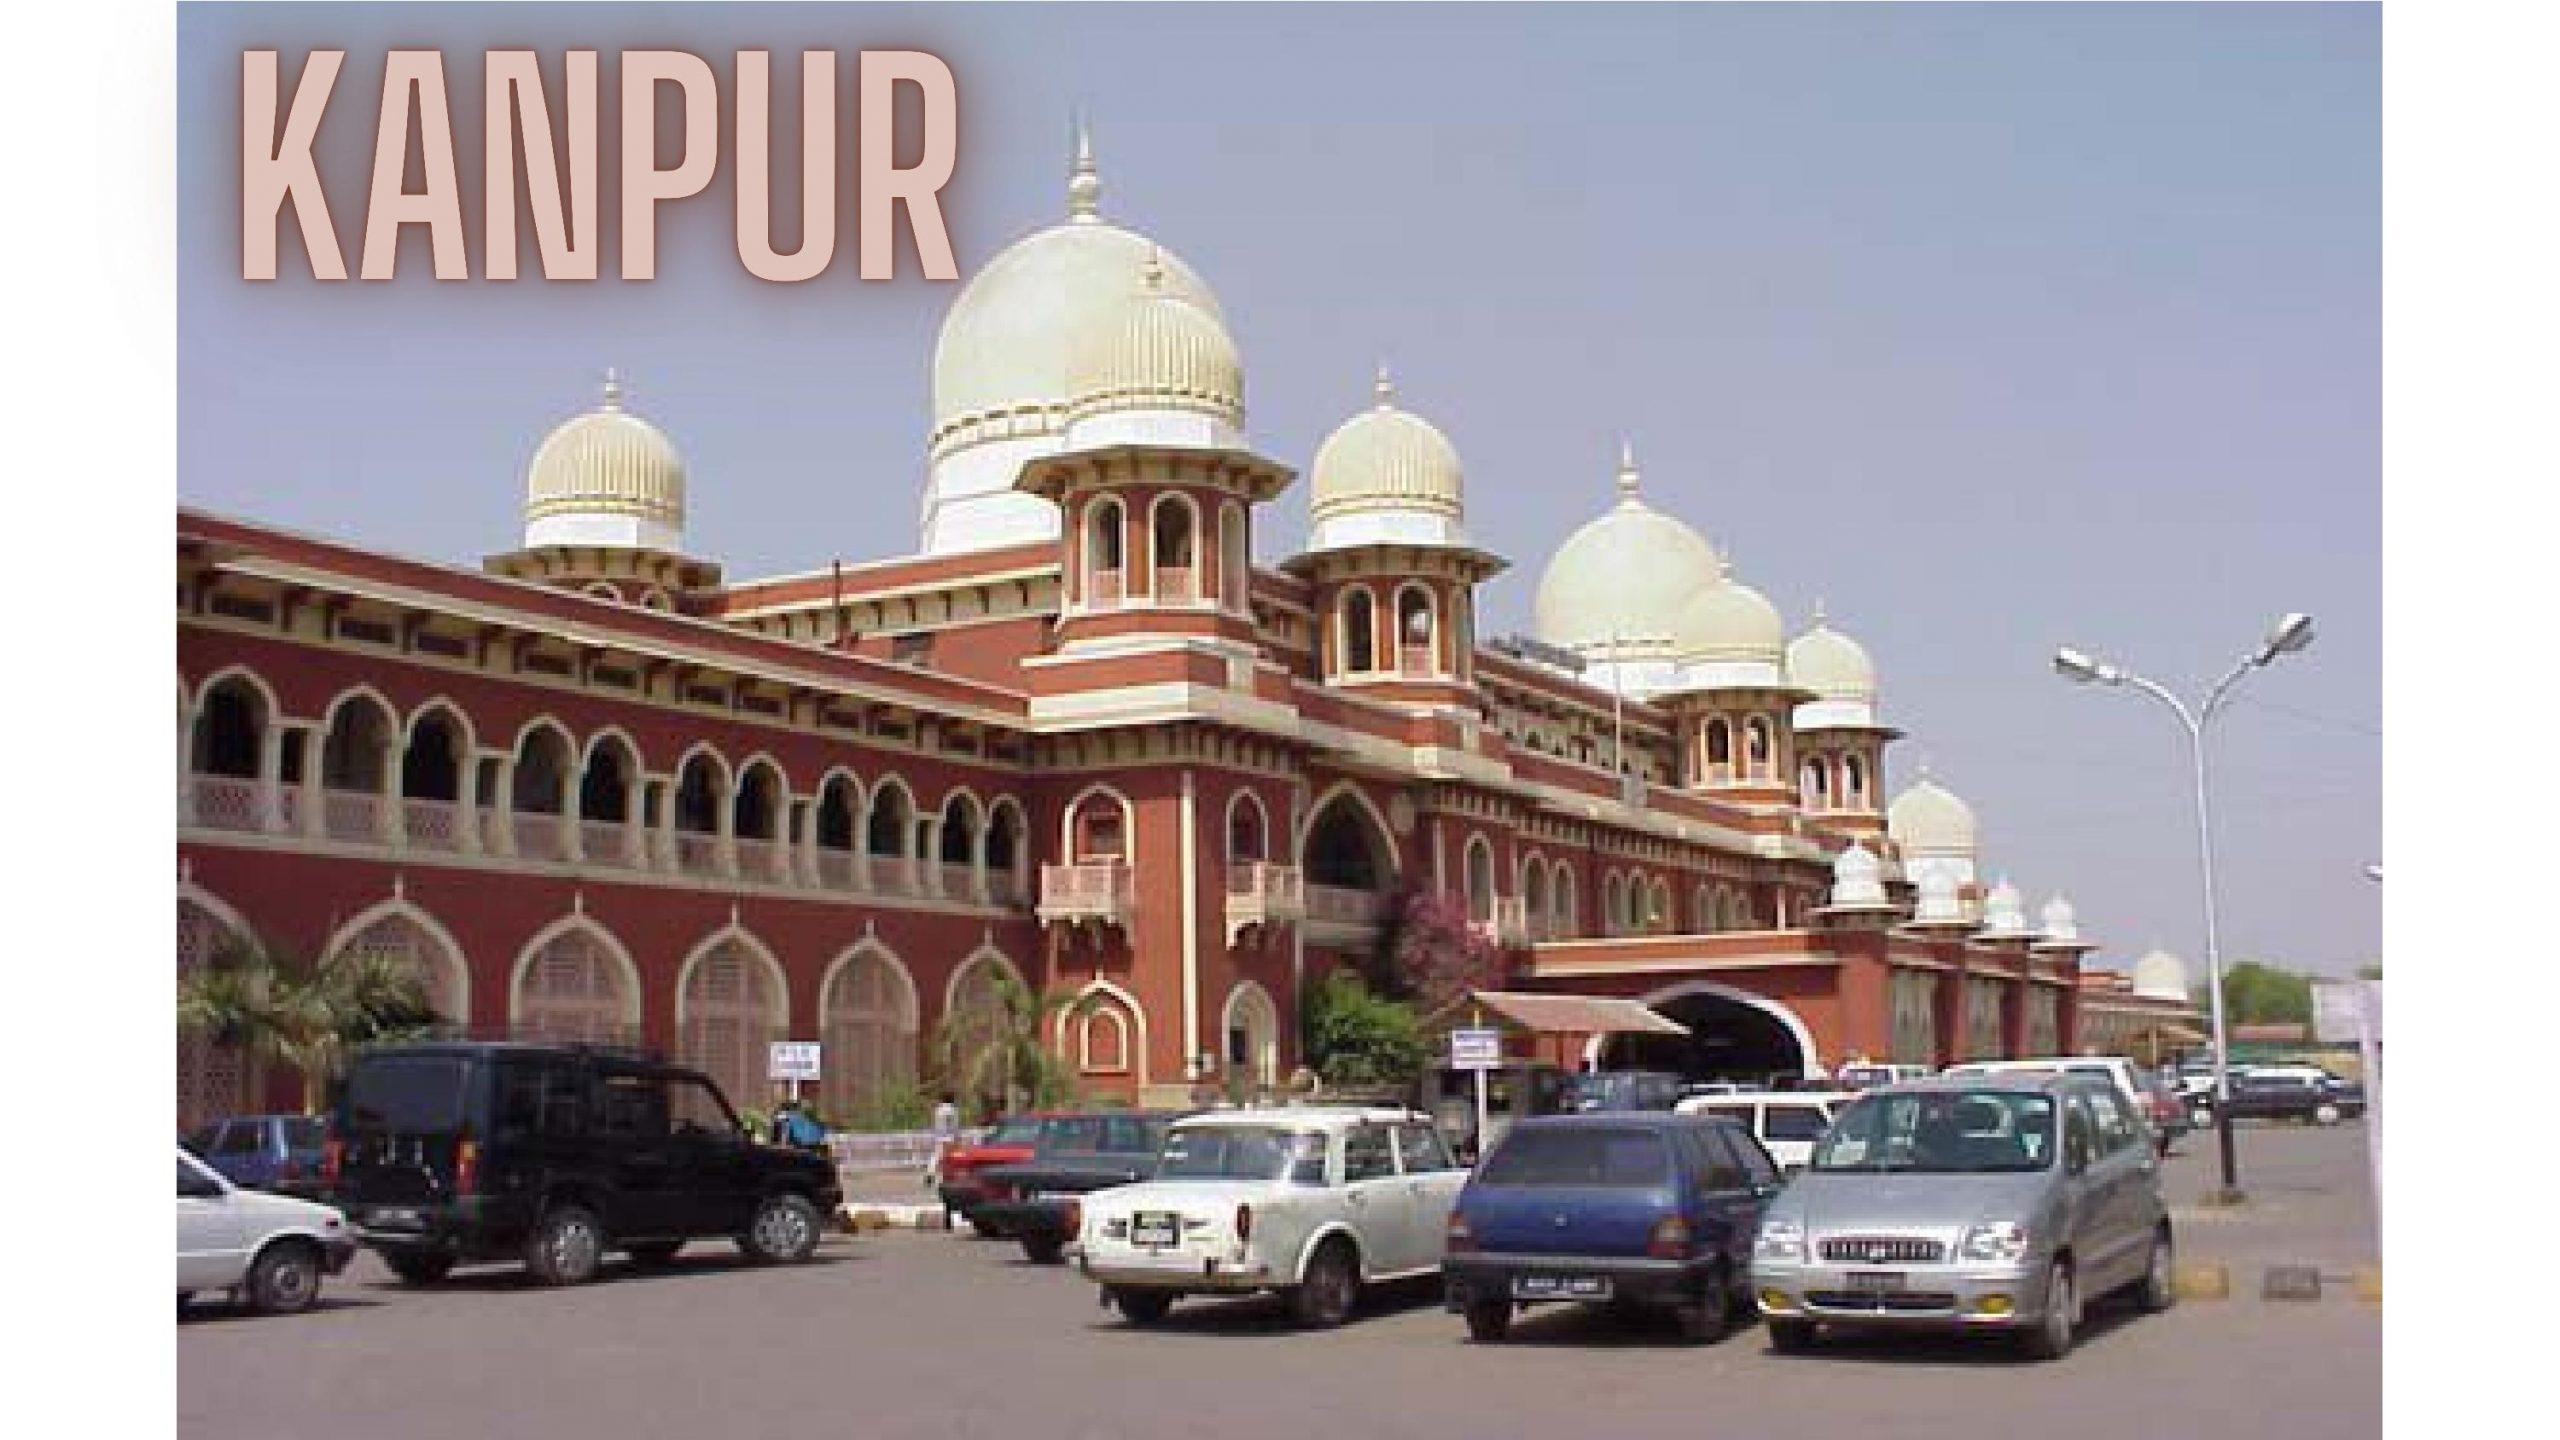 kanpur station interior designer and decorator